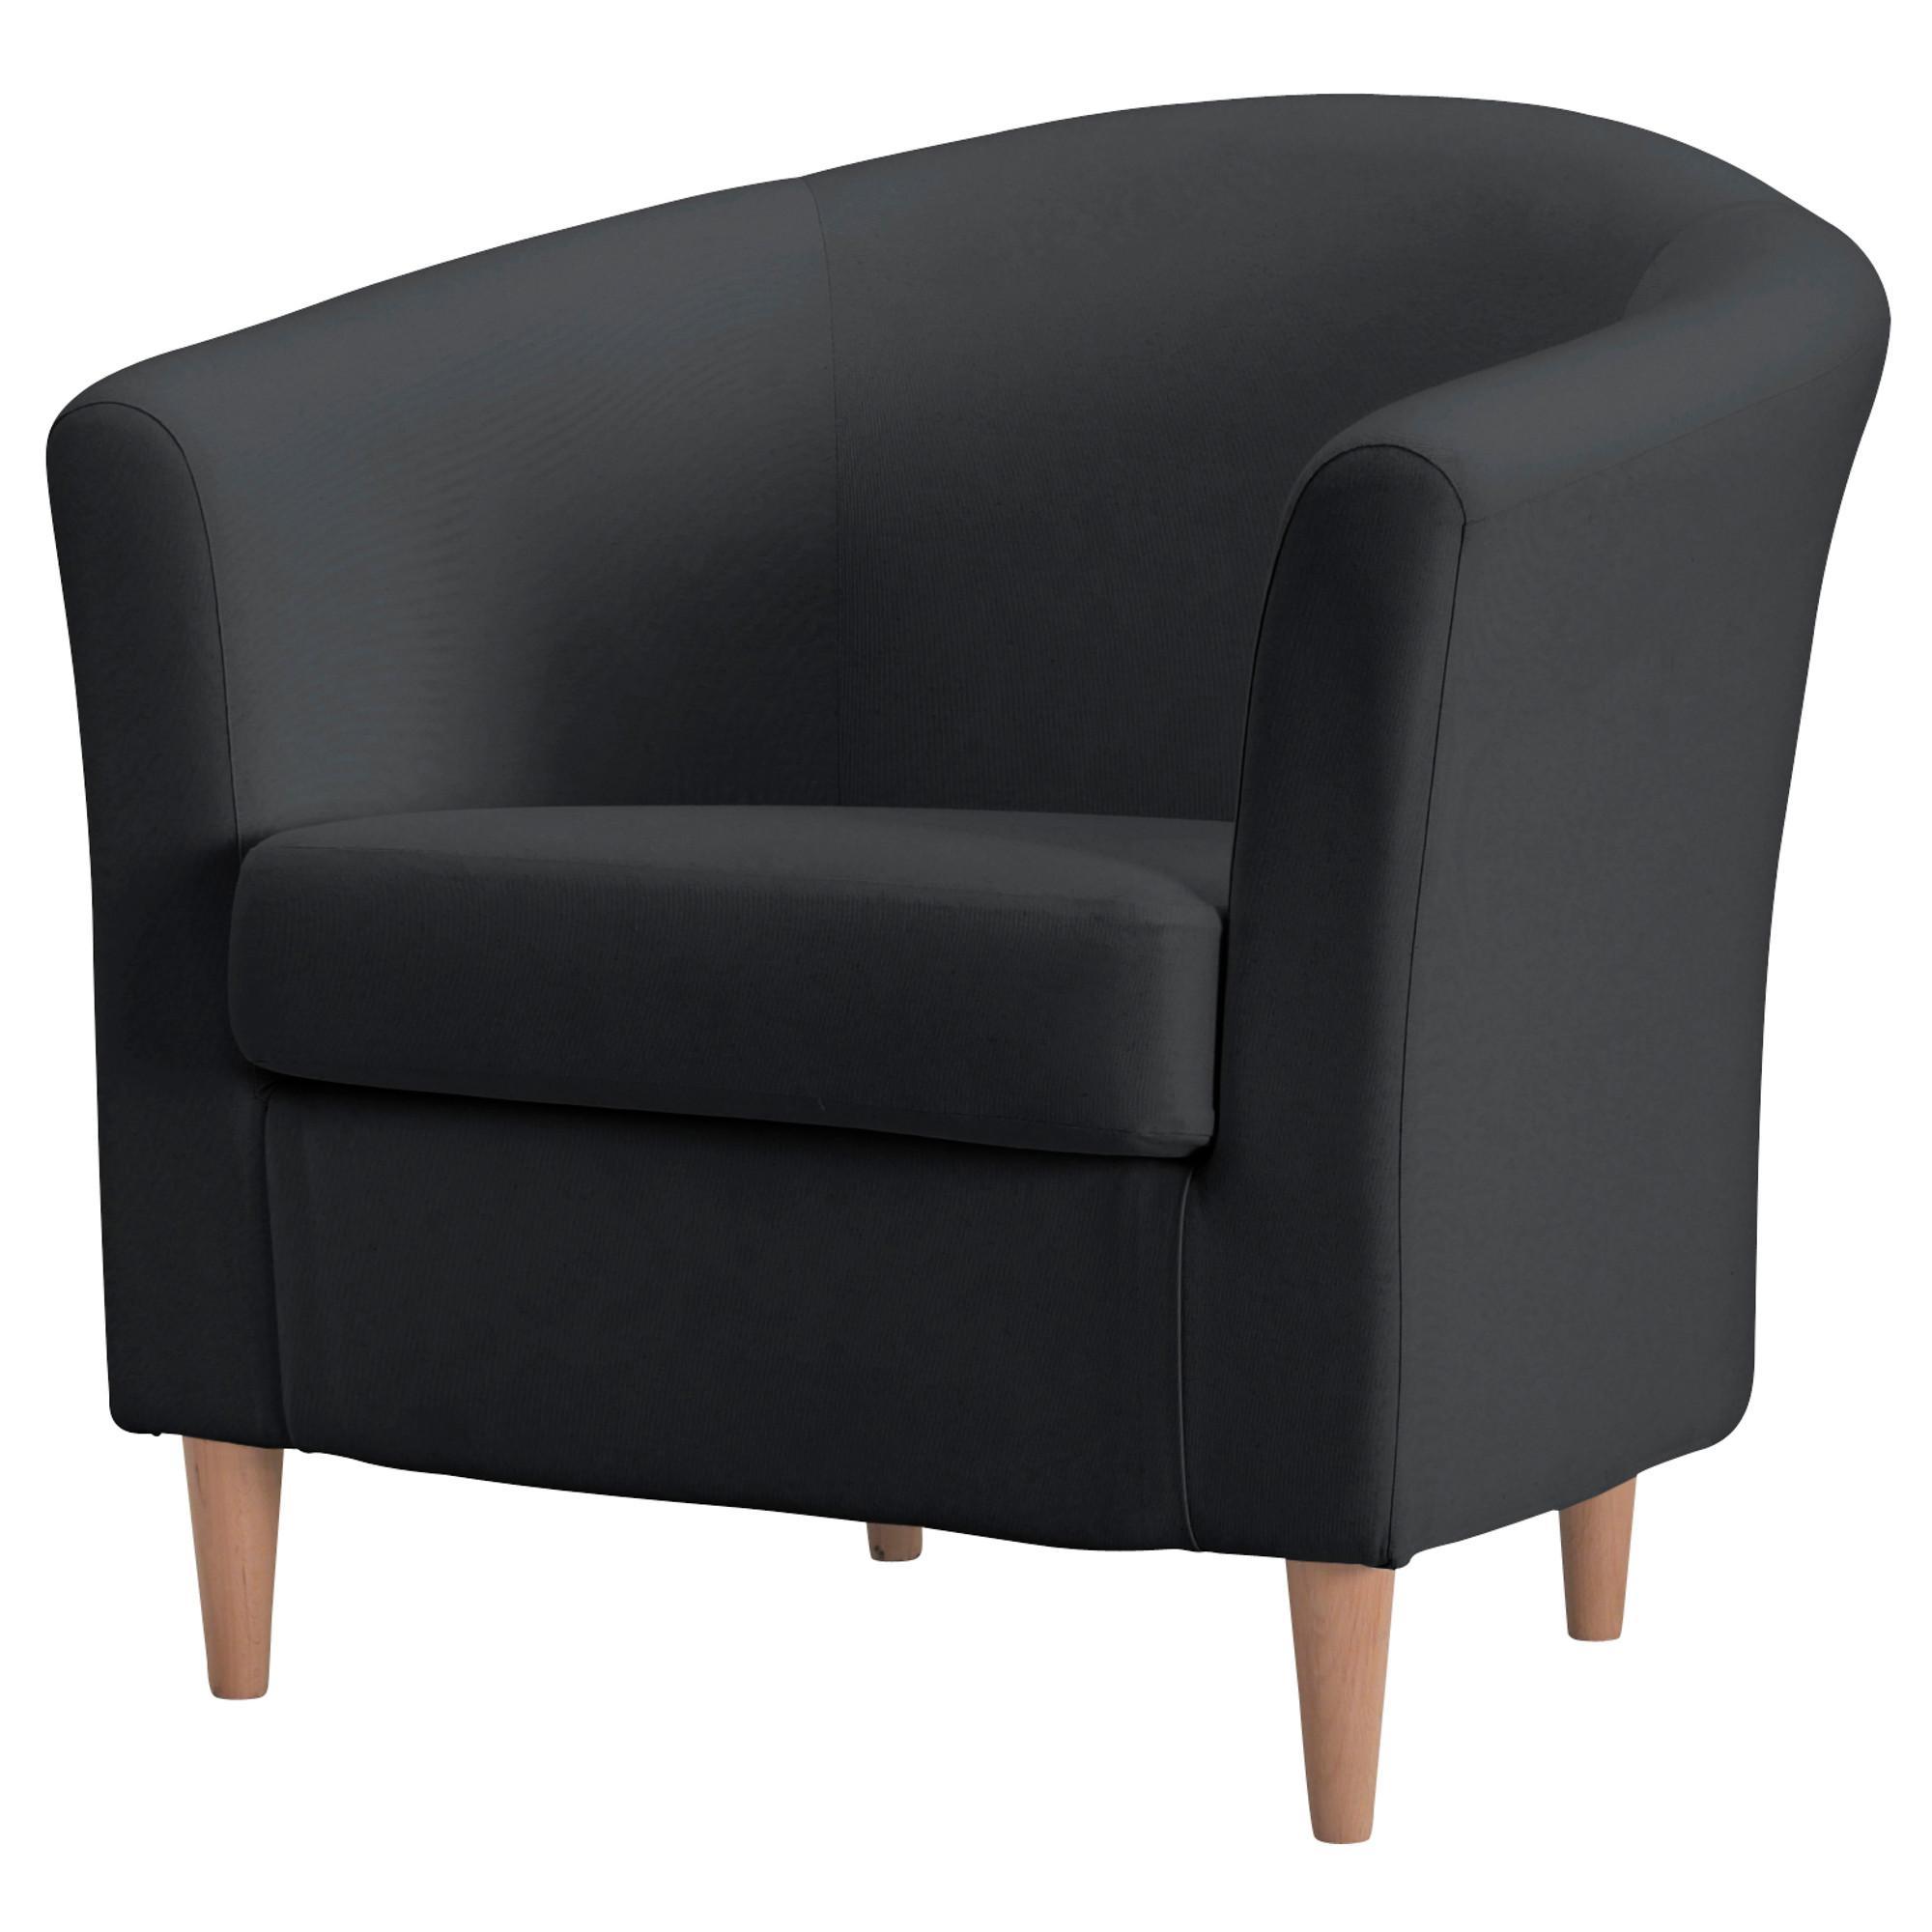 Furniture Home: Lounge Chairs Single Sofa Chairs Modern Elegant Inside Sofa Chairs (View 16 of 20)